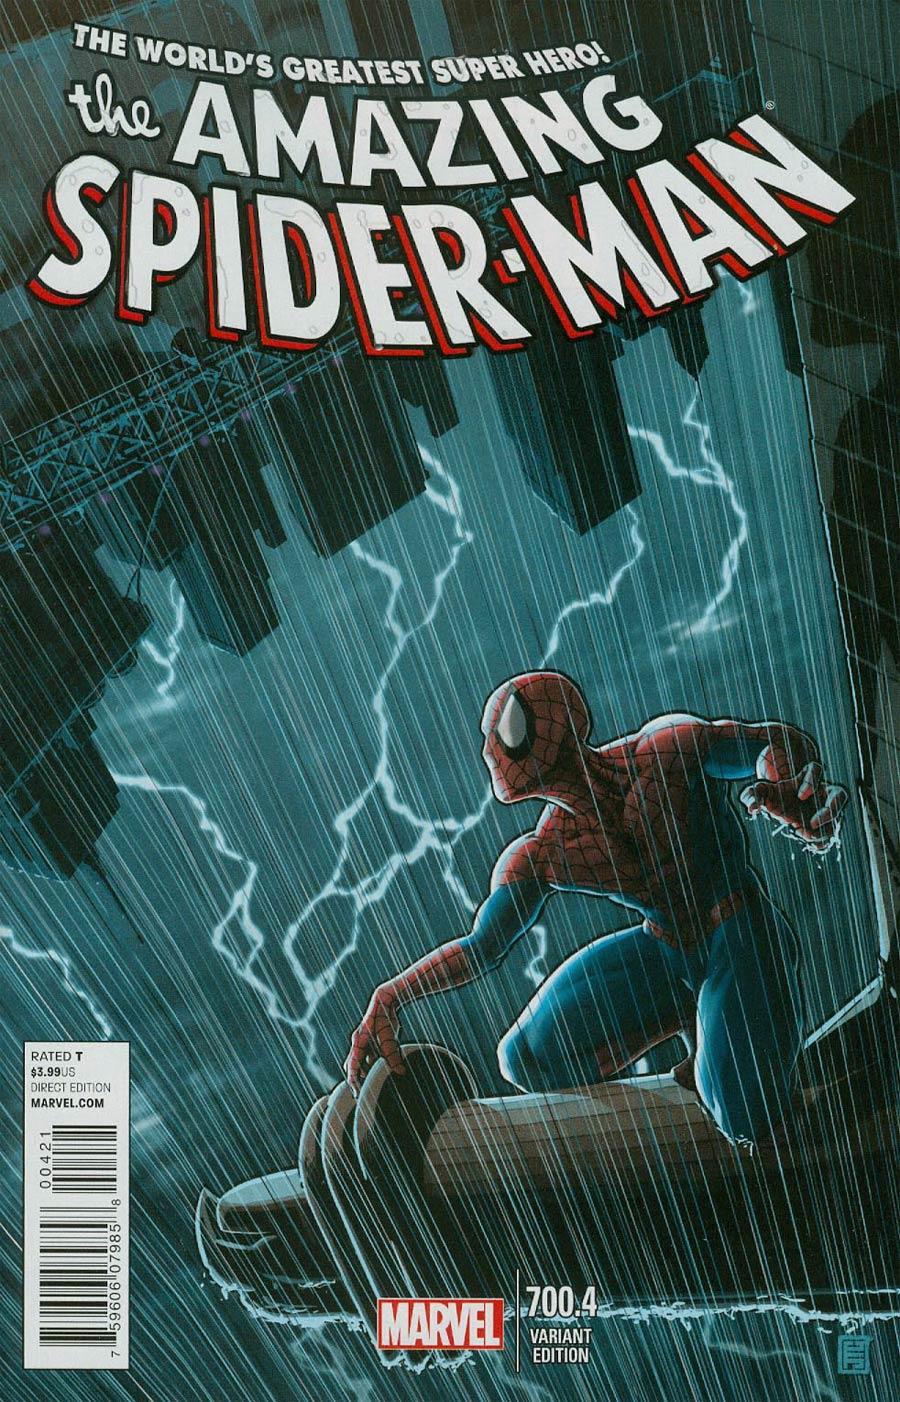 Amazing Spider-Man Vol 2 #700.4 Cover B Variant John Tyler Christopher Cover